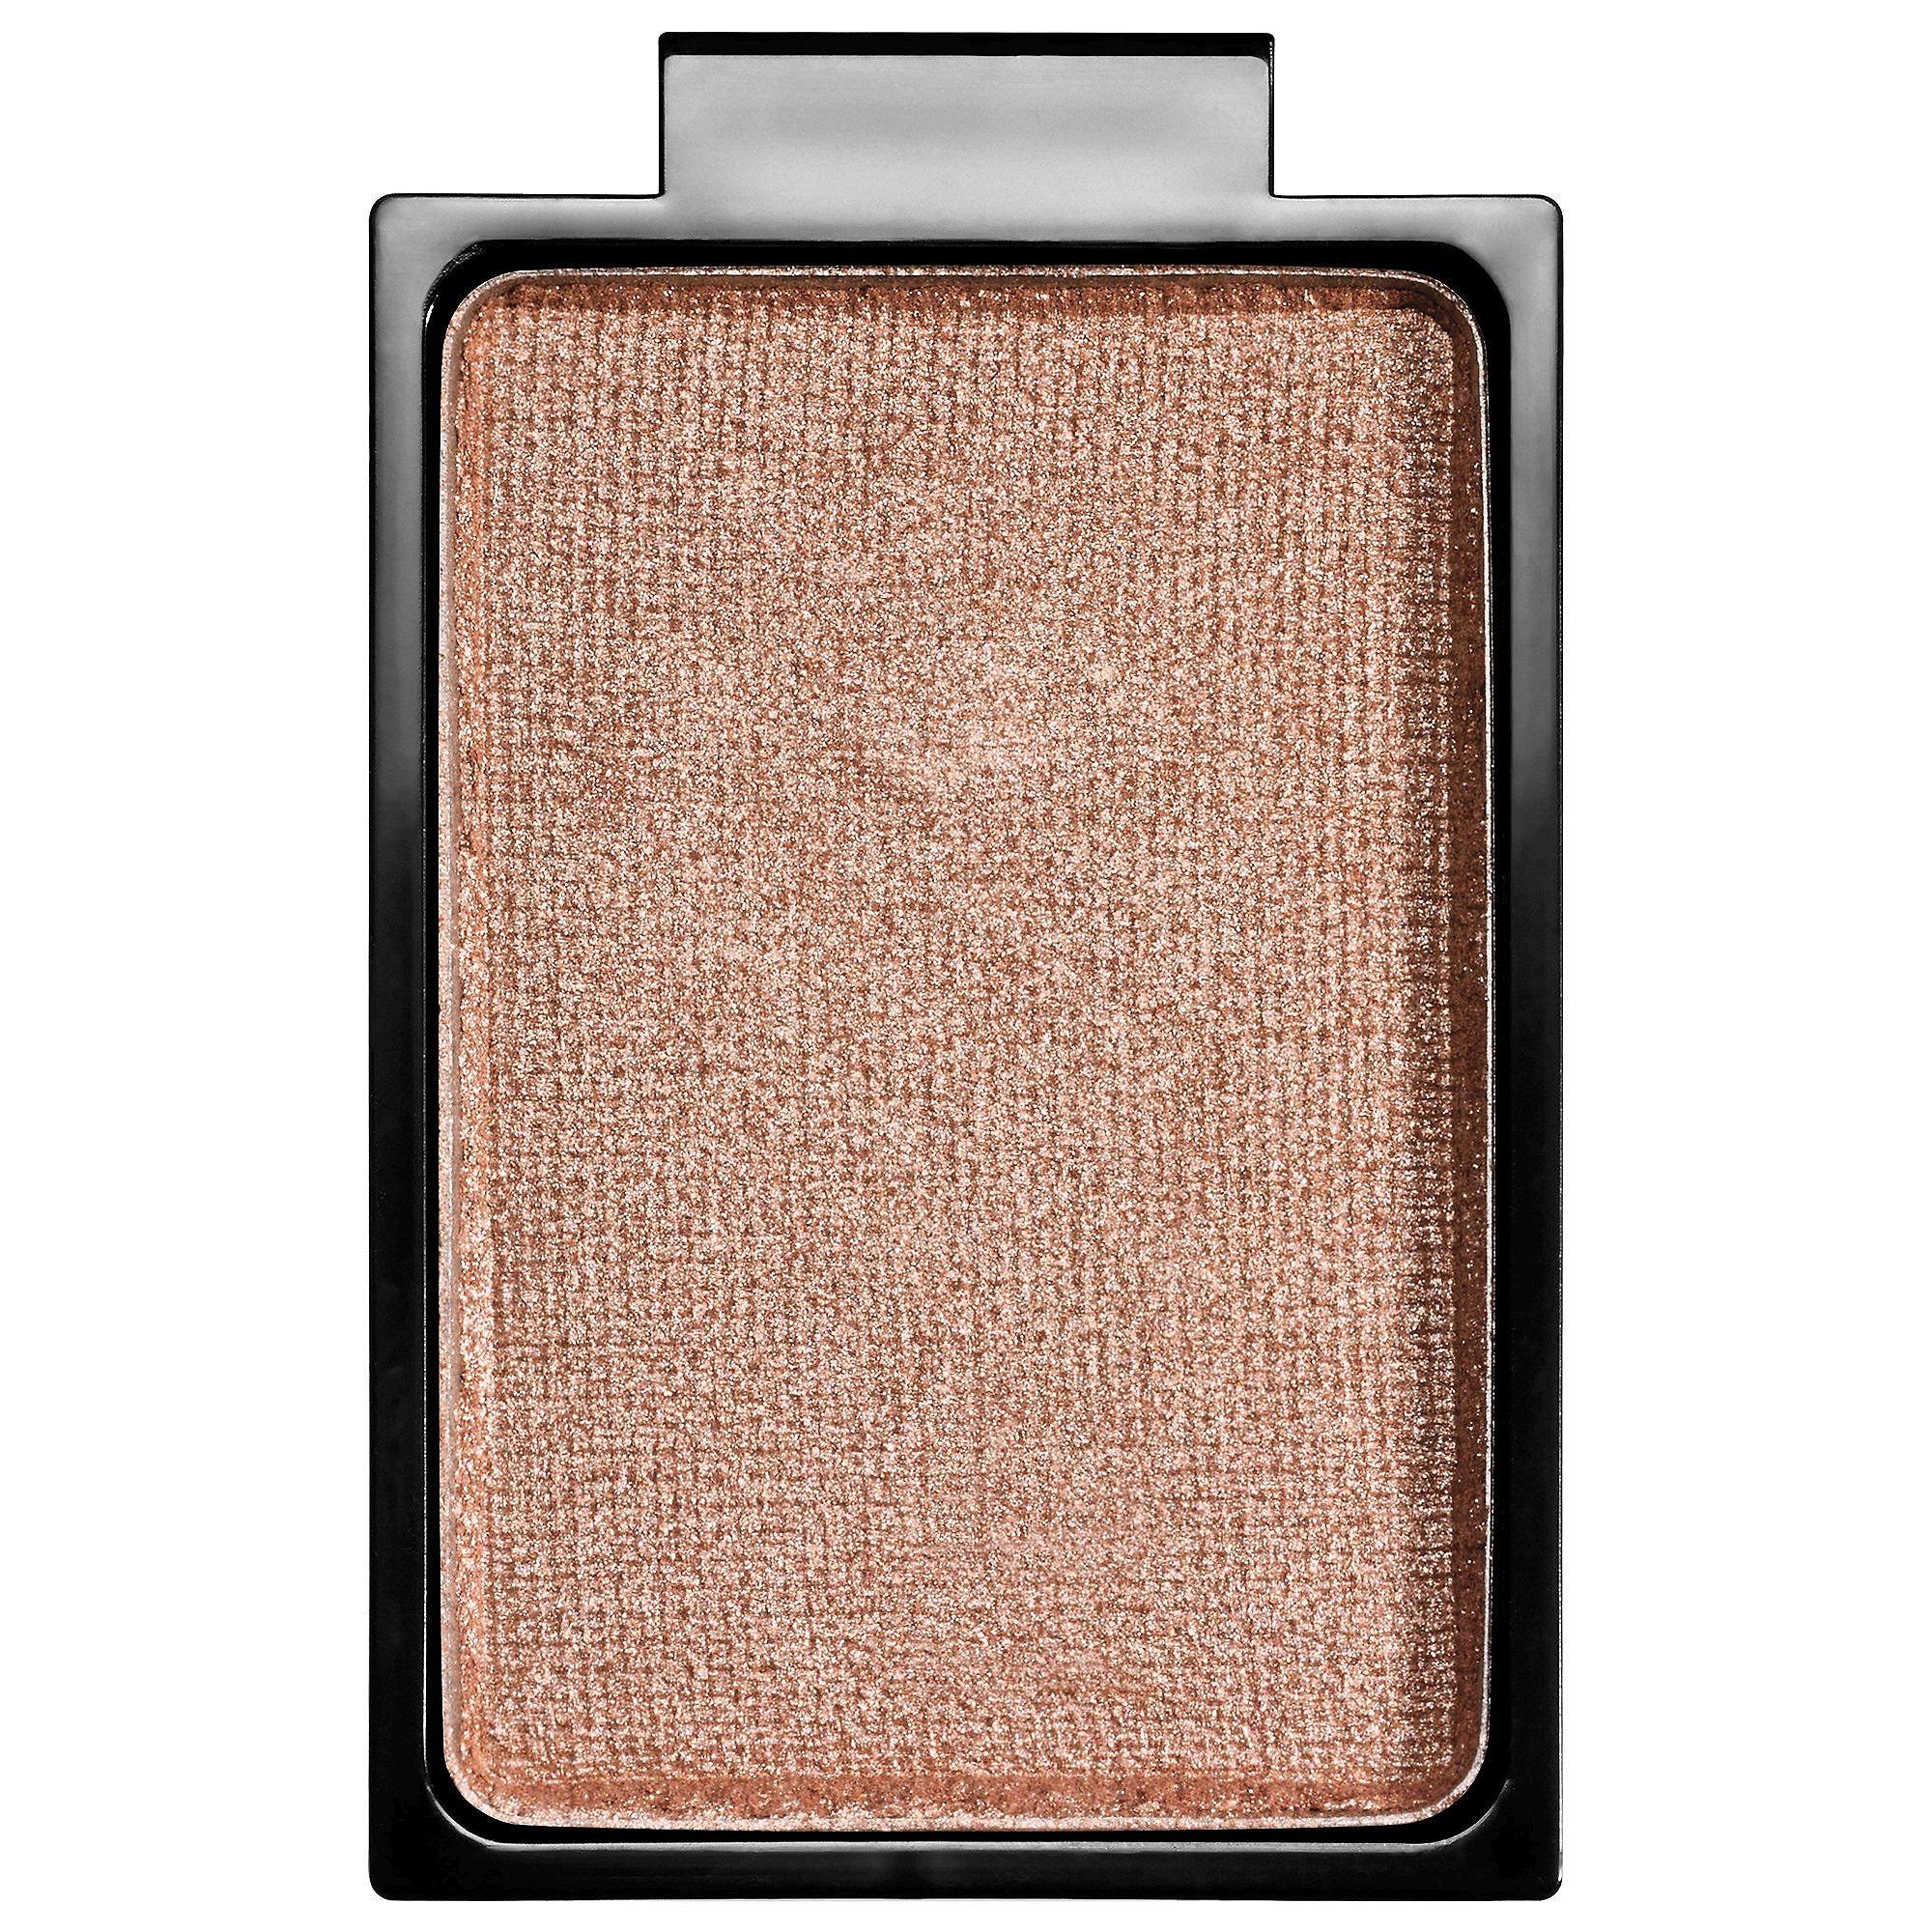 Buxom Customizable Eyeshadow Bar Single Refills - Single Eye Shadow Bar - Champagne Buzz (shimmering pearl) 0.05 oz by Buxom (Image #1)